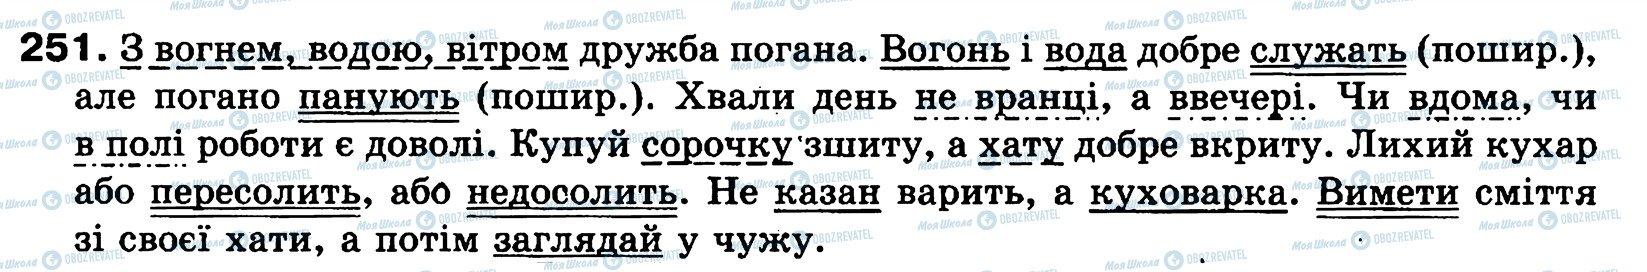 ГДЗ Укр мова 8 класс страница 251